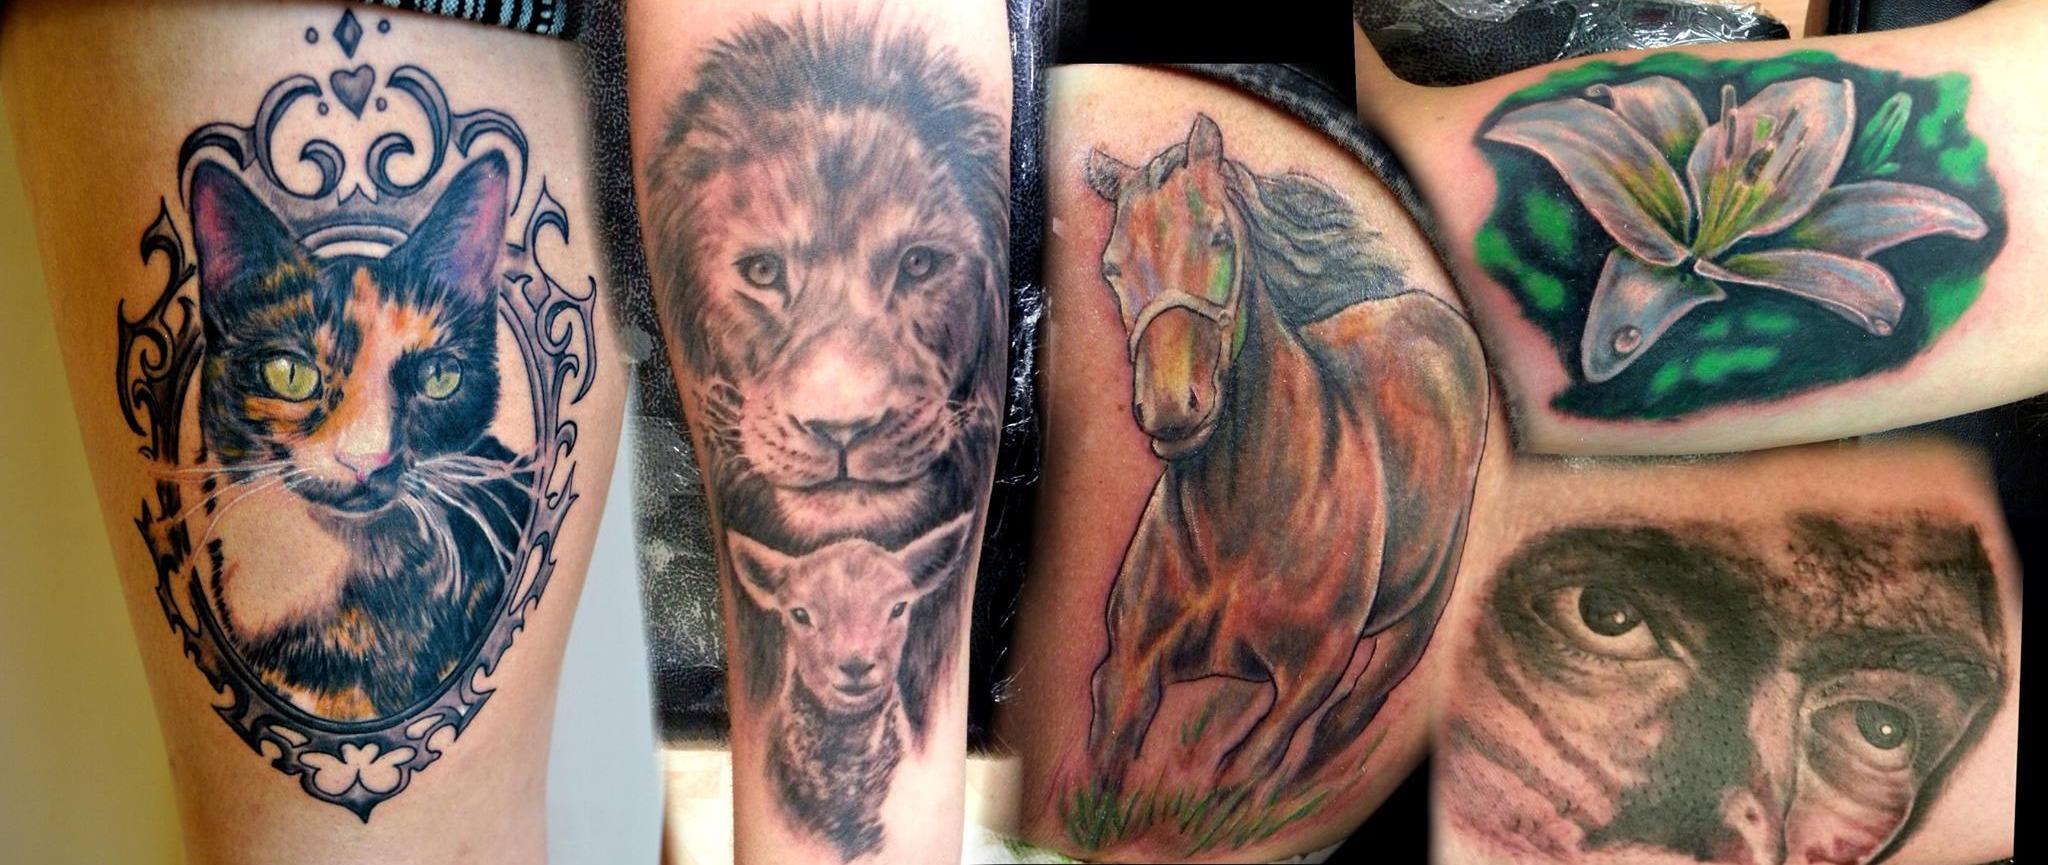 Alpha & Omega Tattoo Parlor in St George, UT 84770 ...